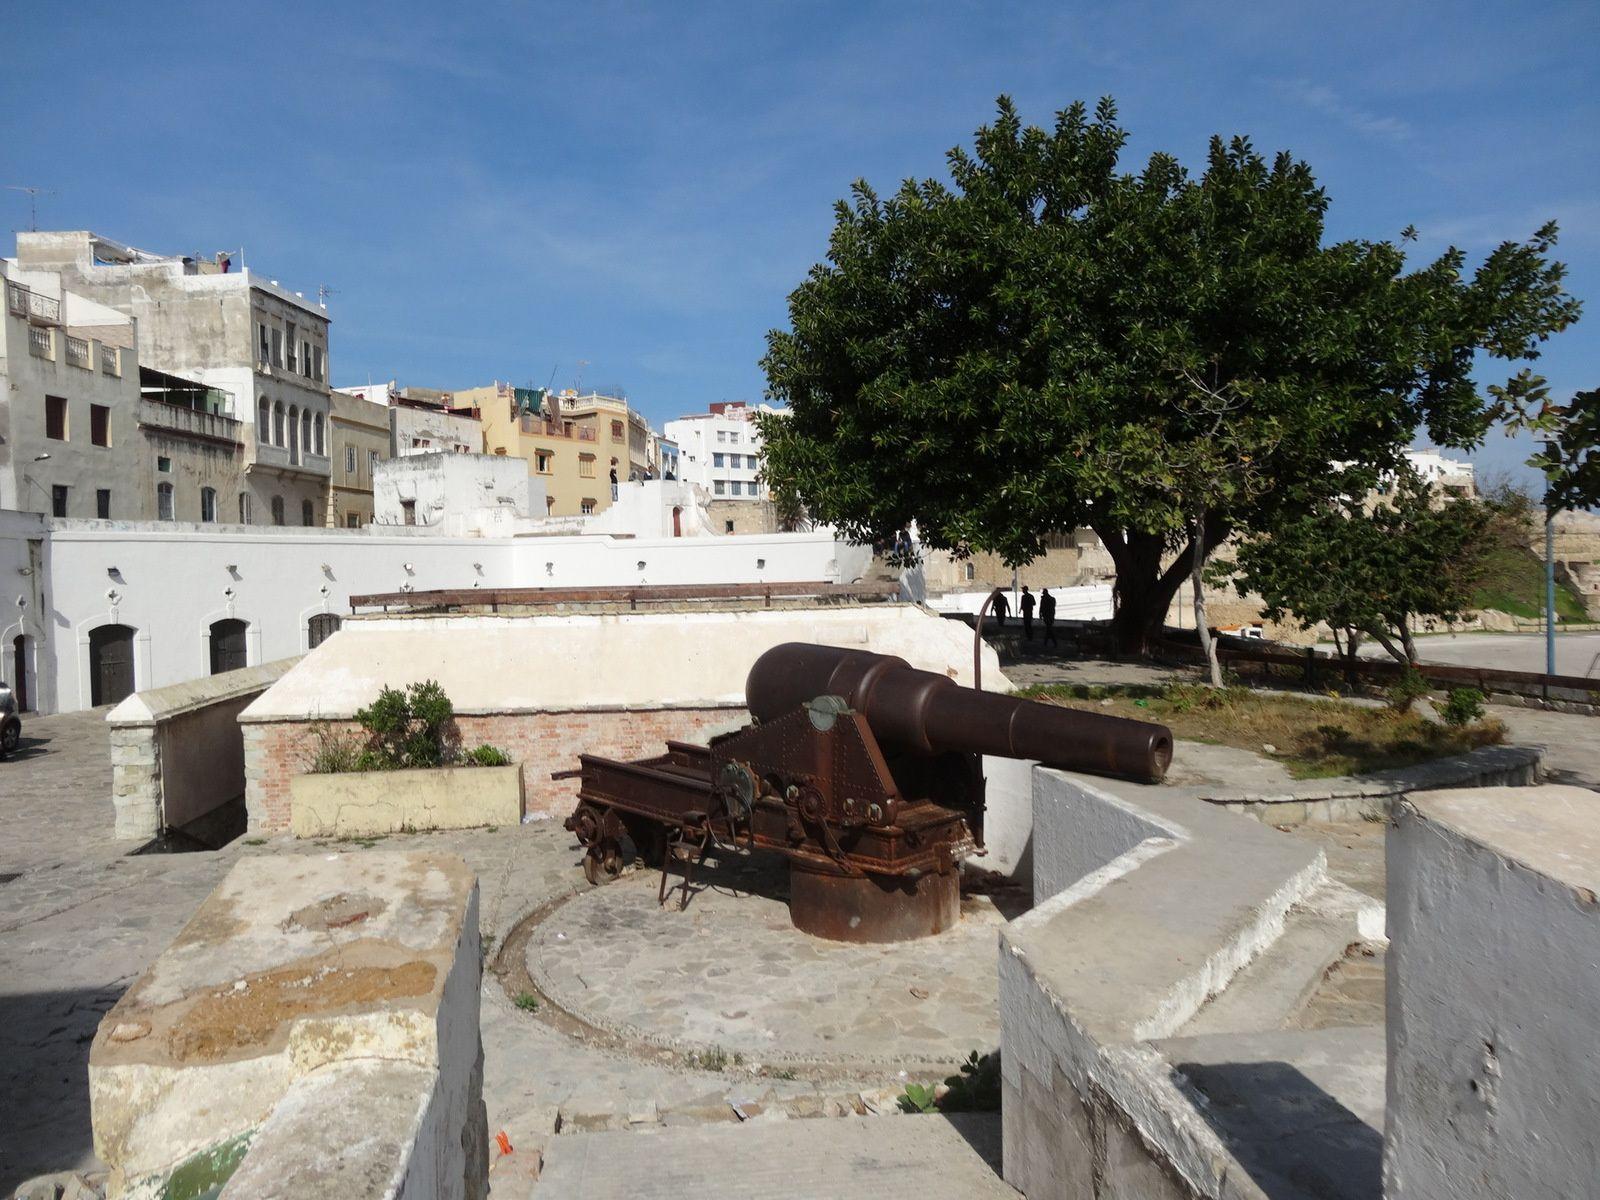 Borj al-Hajoui, Médina de Tanger (4 photos)